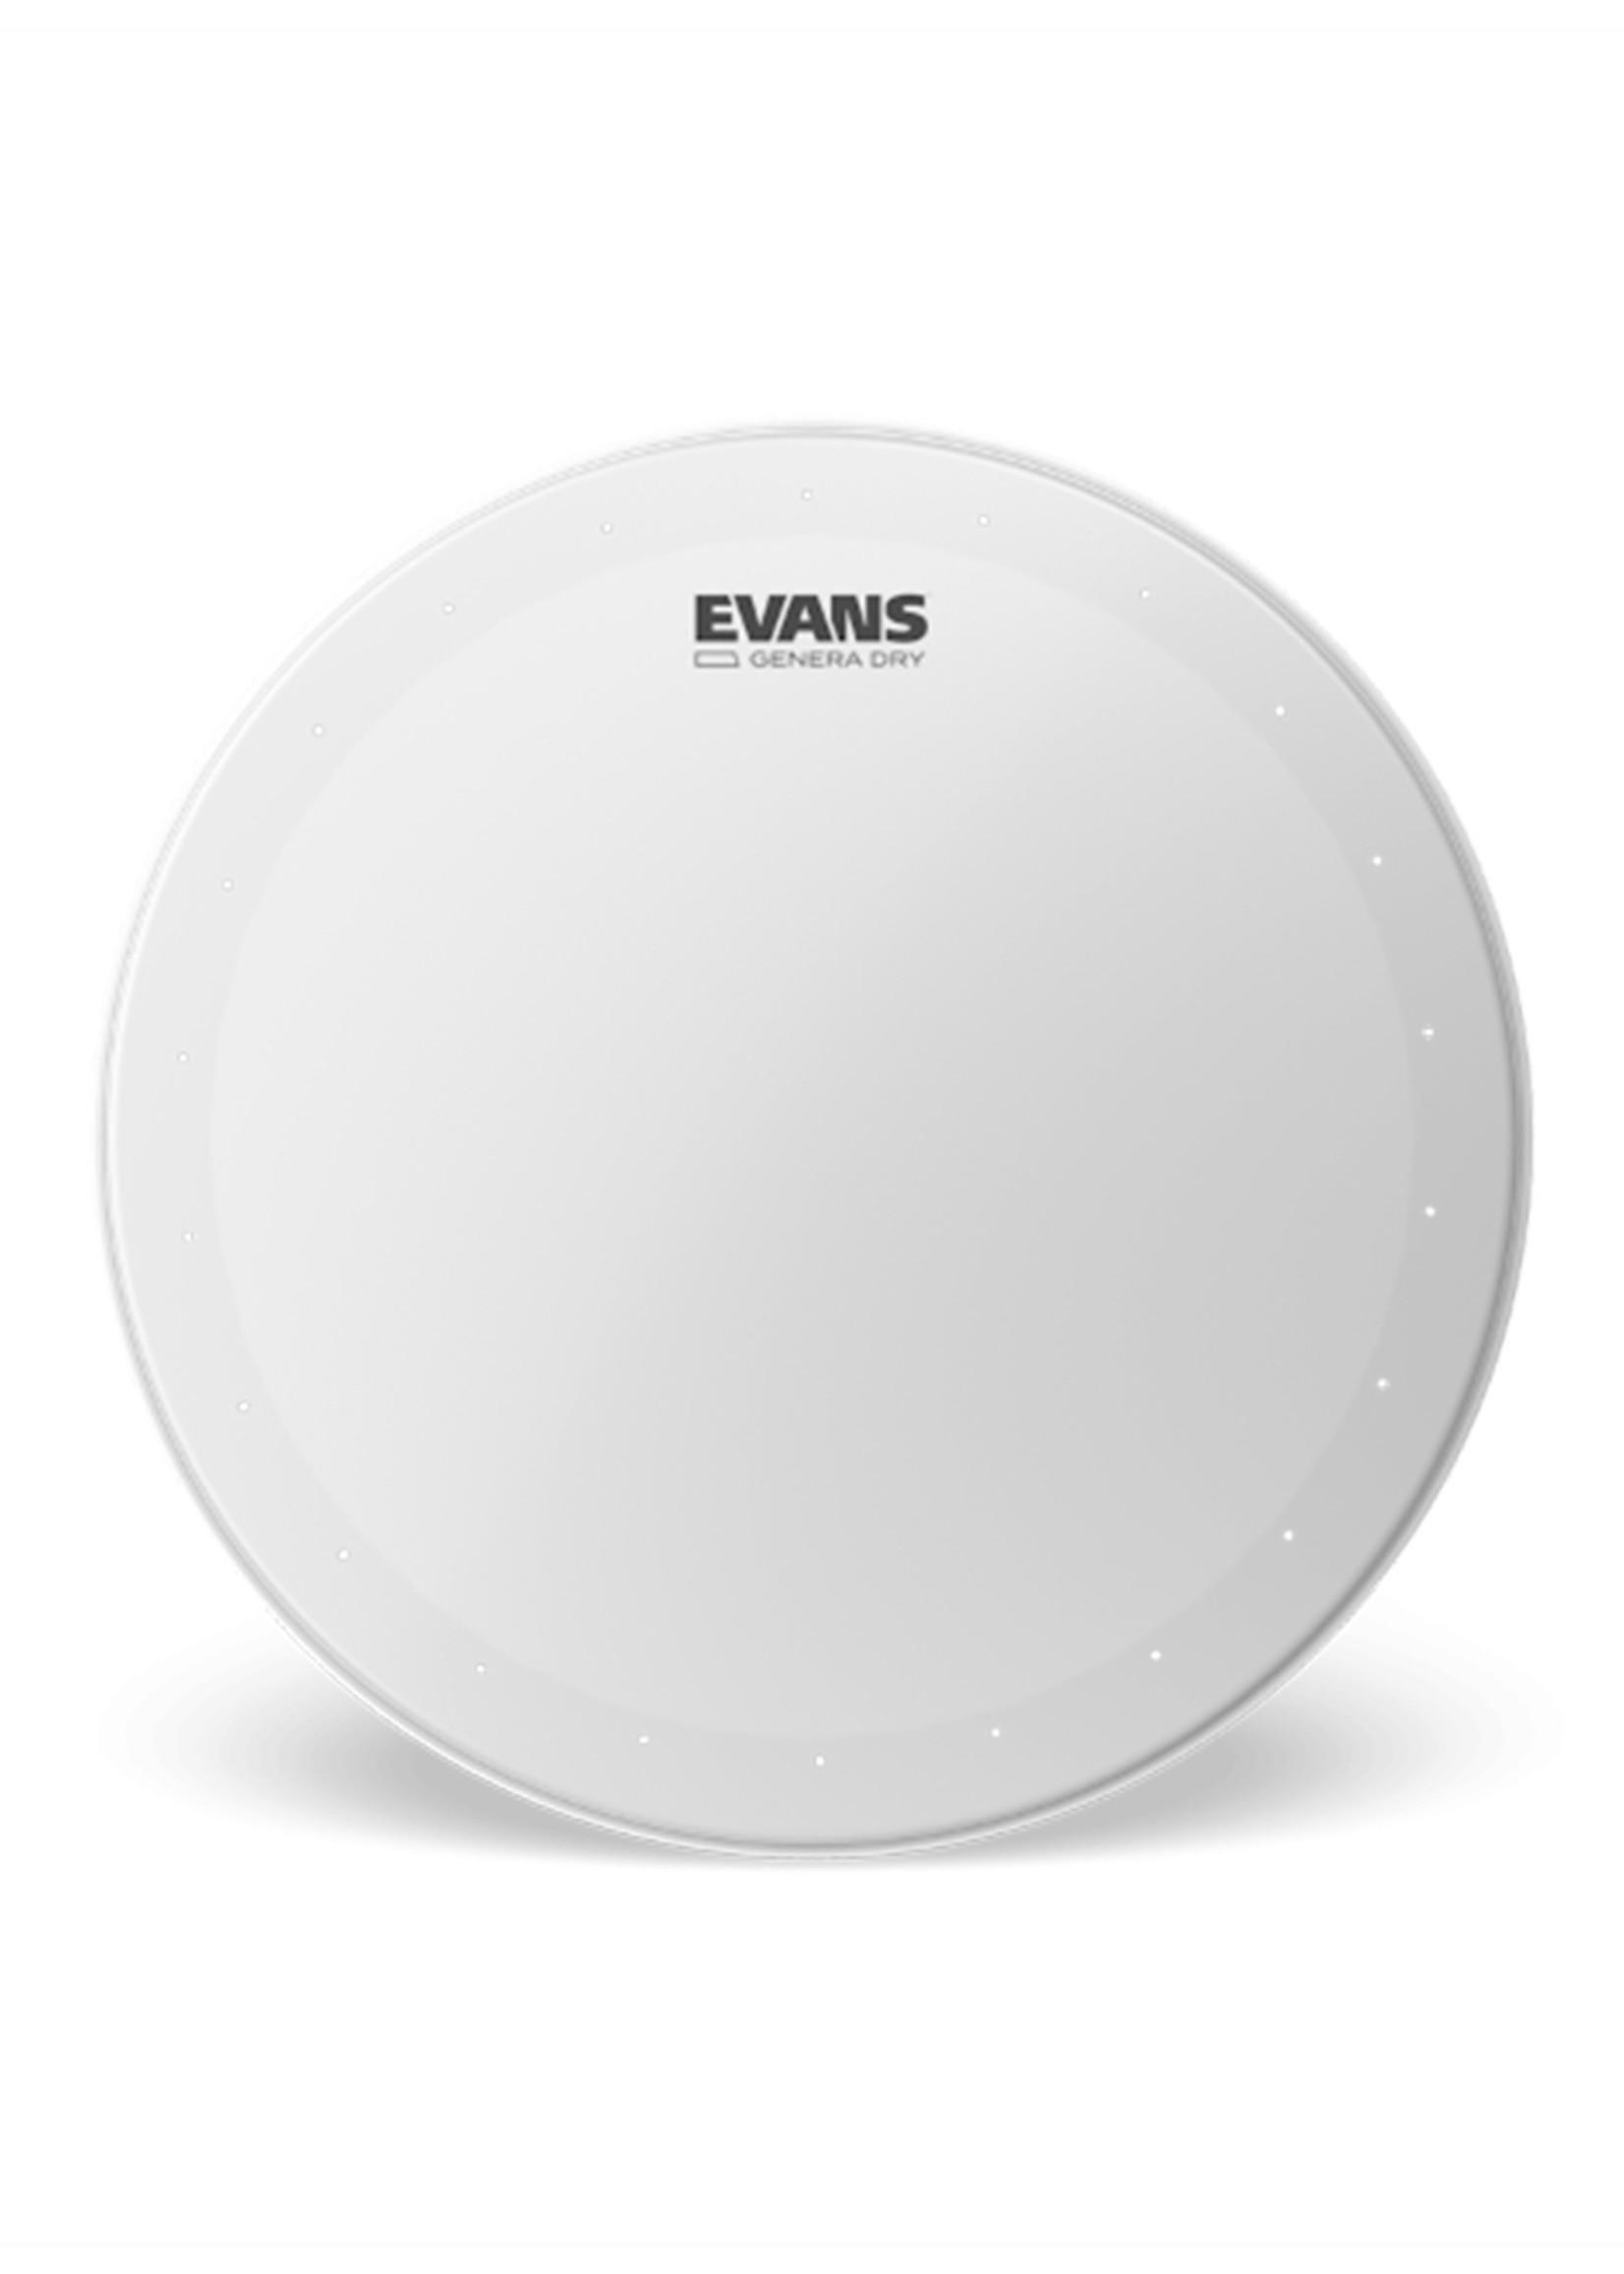 Evans EvansB13DRY  Genera Dry